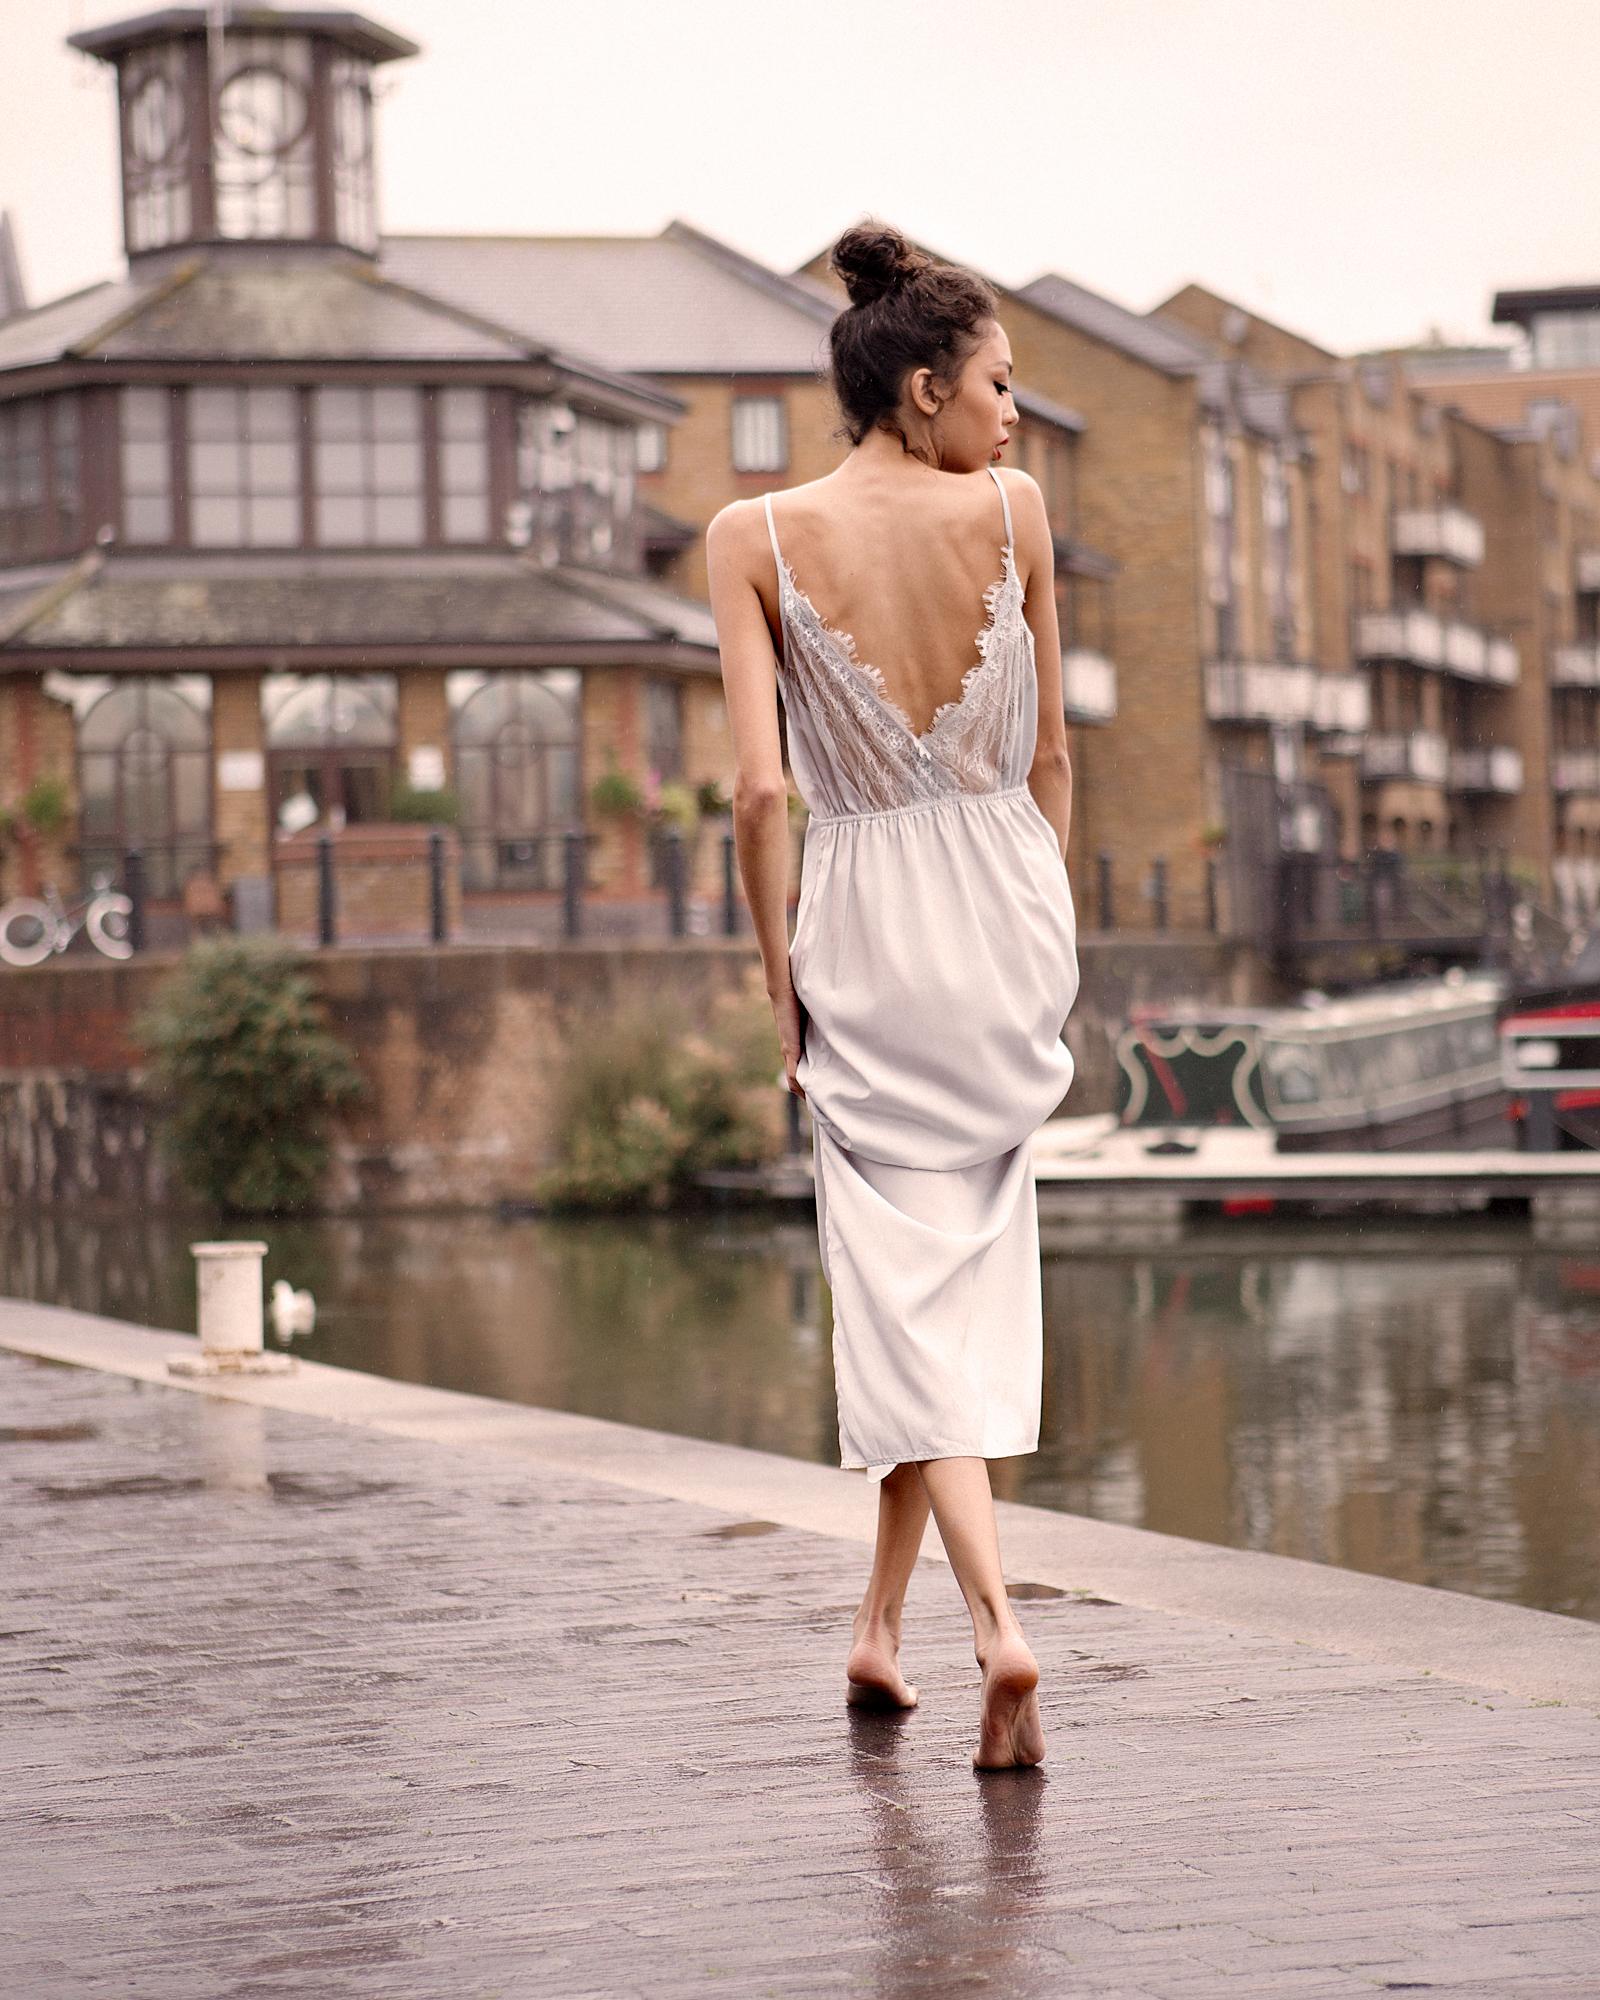 @scysa in our Sienna dress